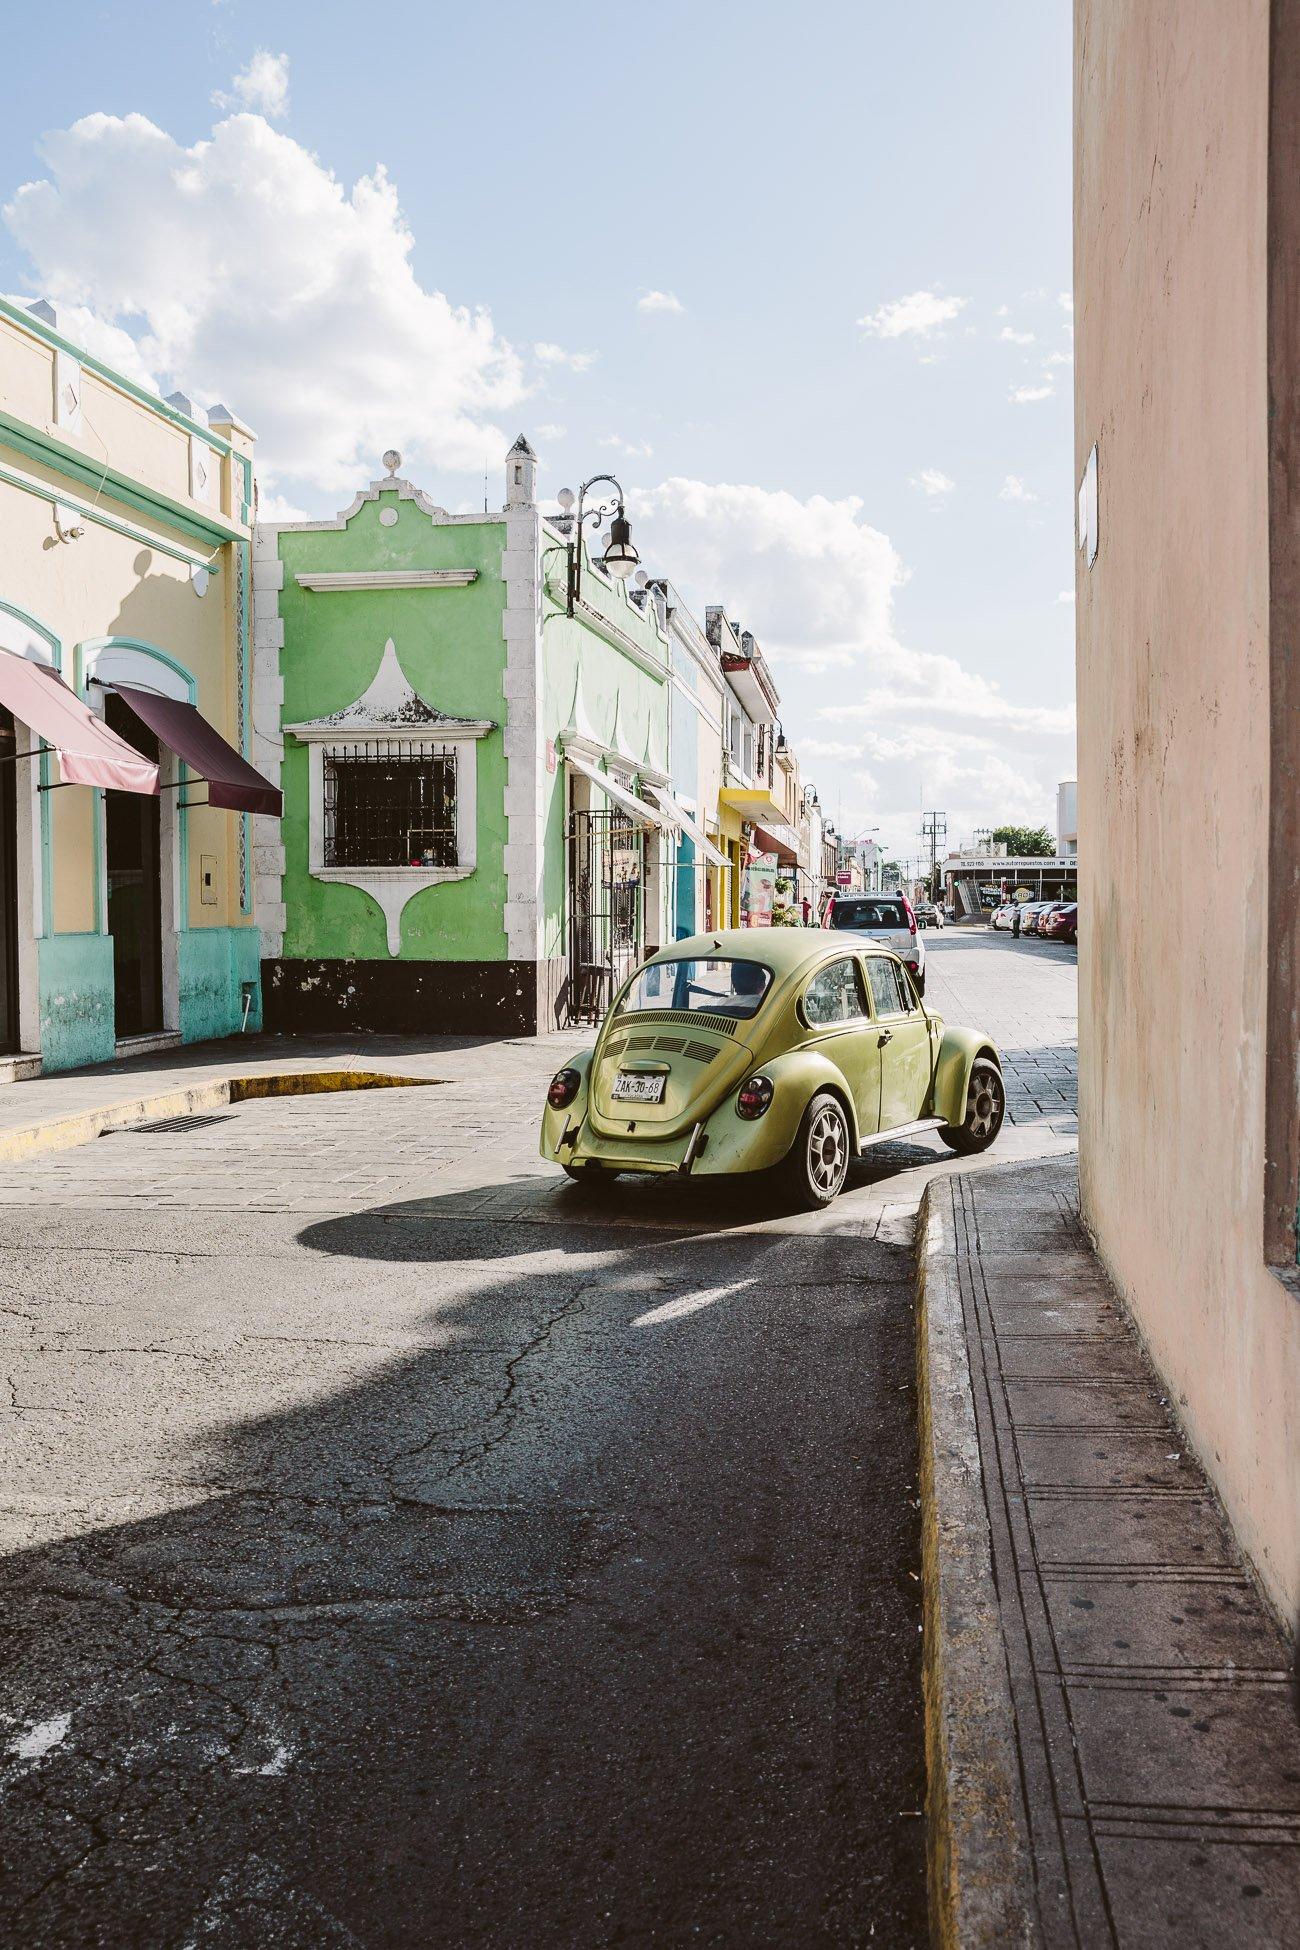 Streets of Mérida Yucatán Mexico